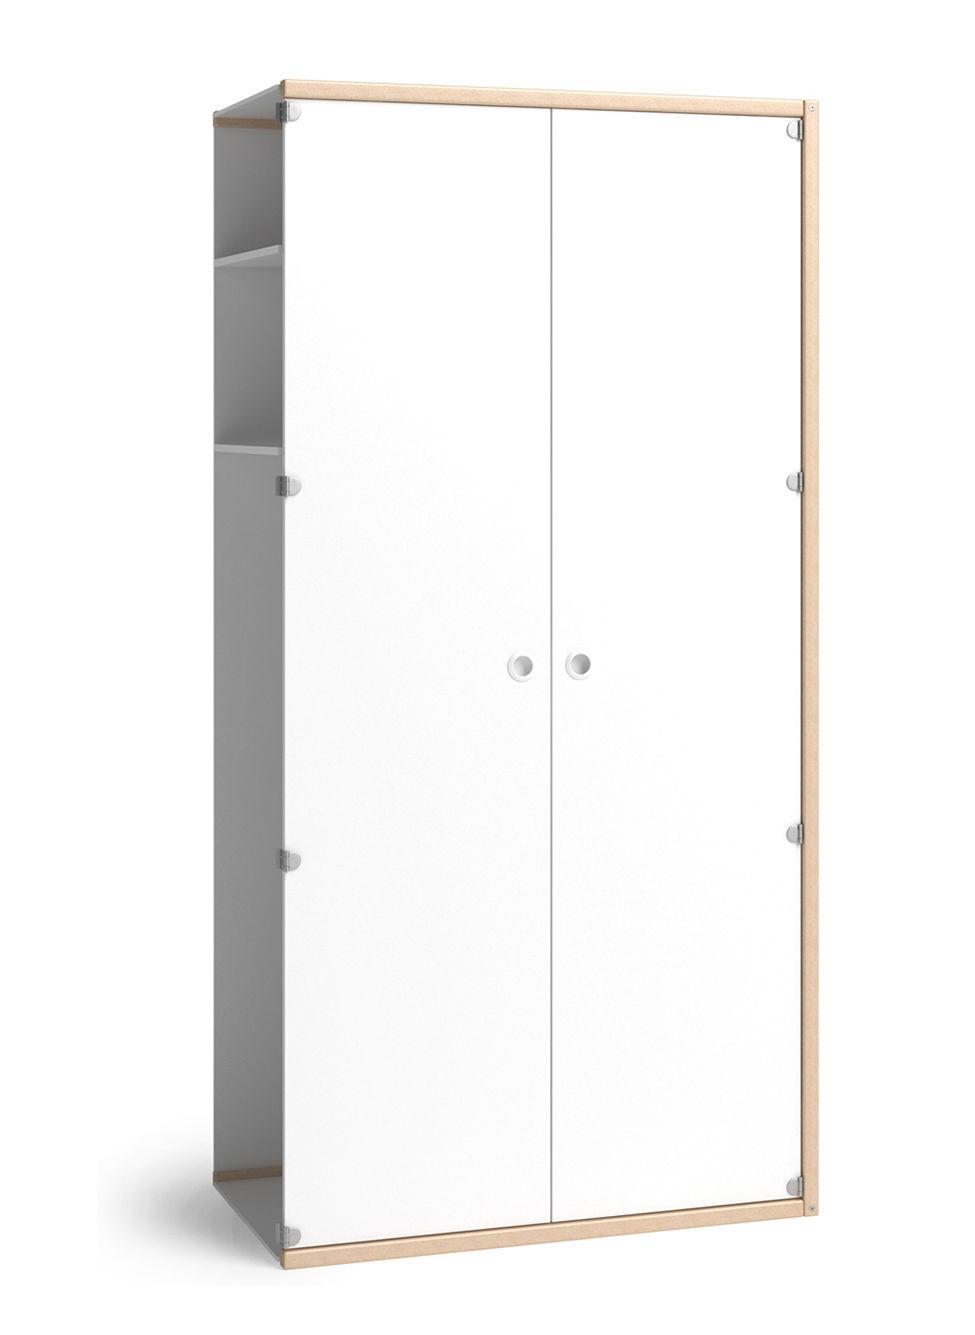 Flötotto Profilsystem contemporary wardrobe wooden with swing doors profilsystem